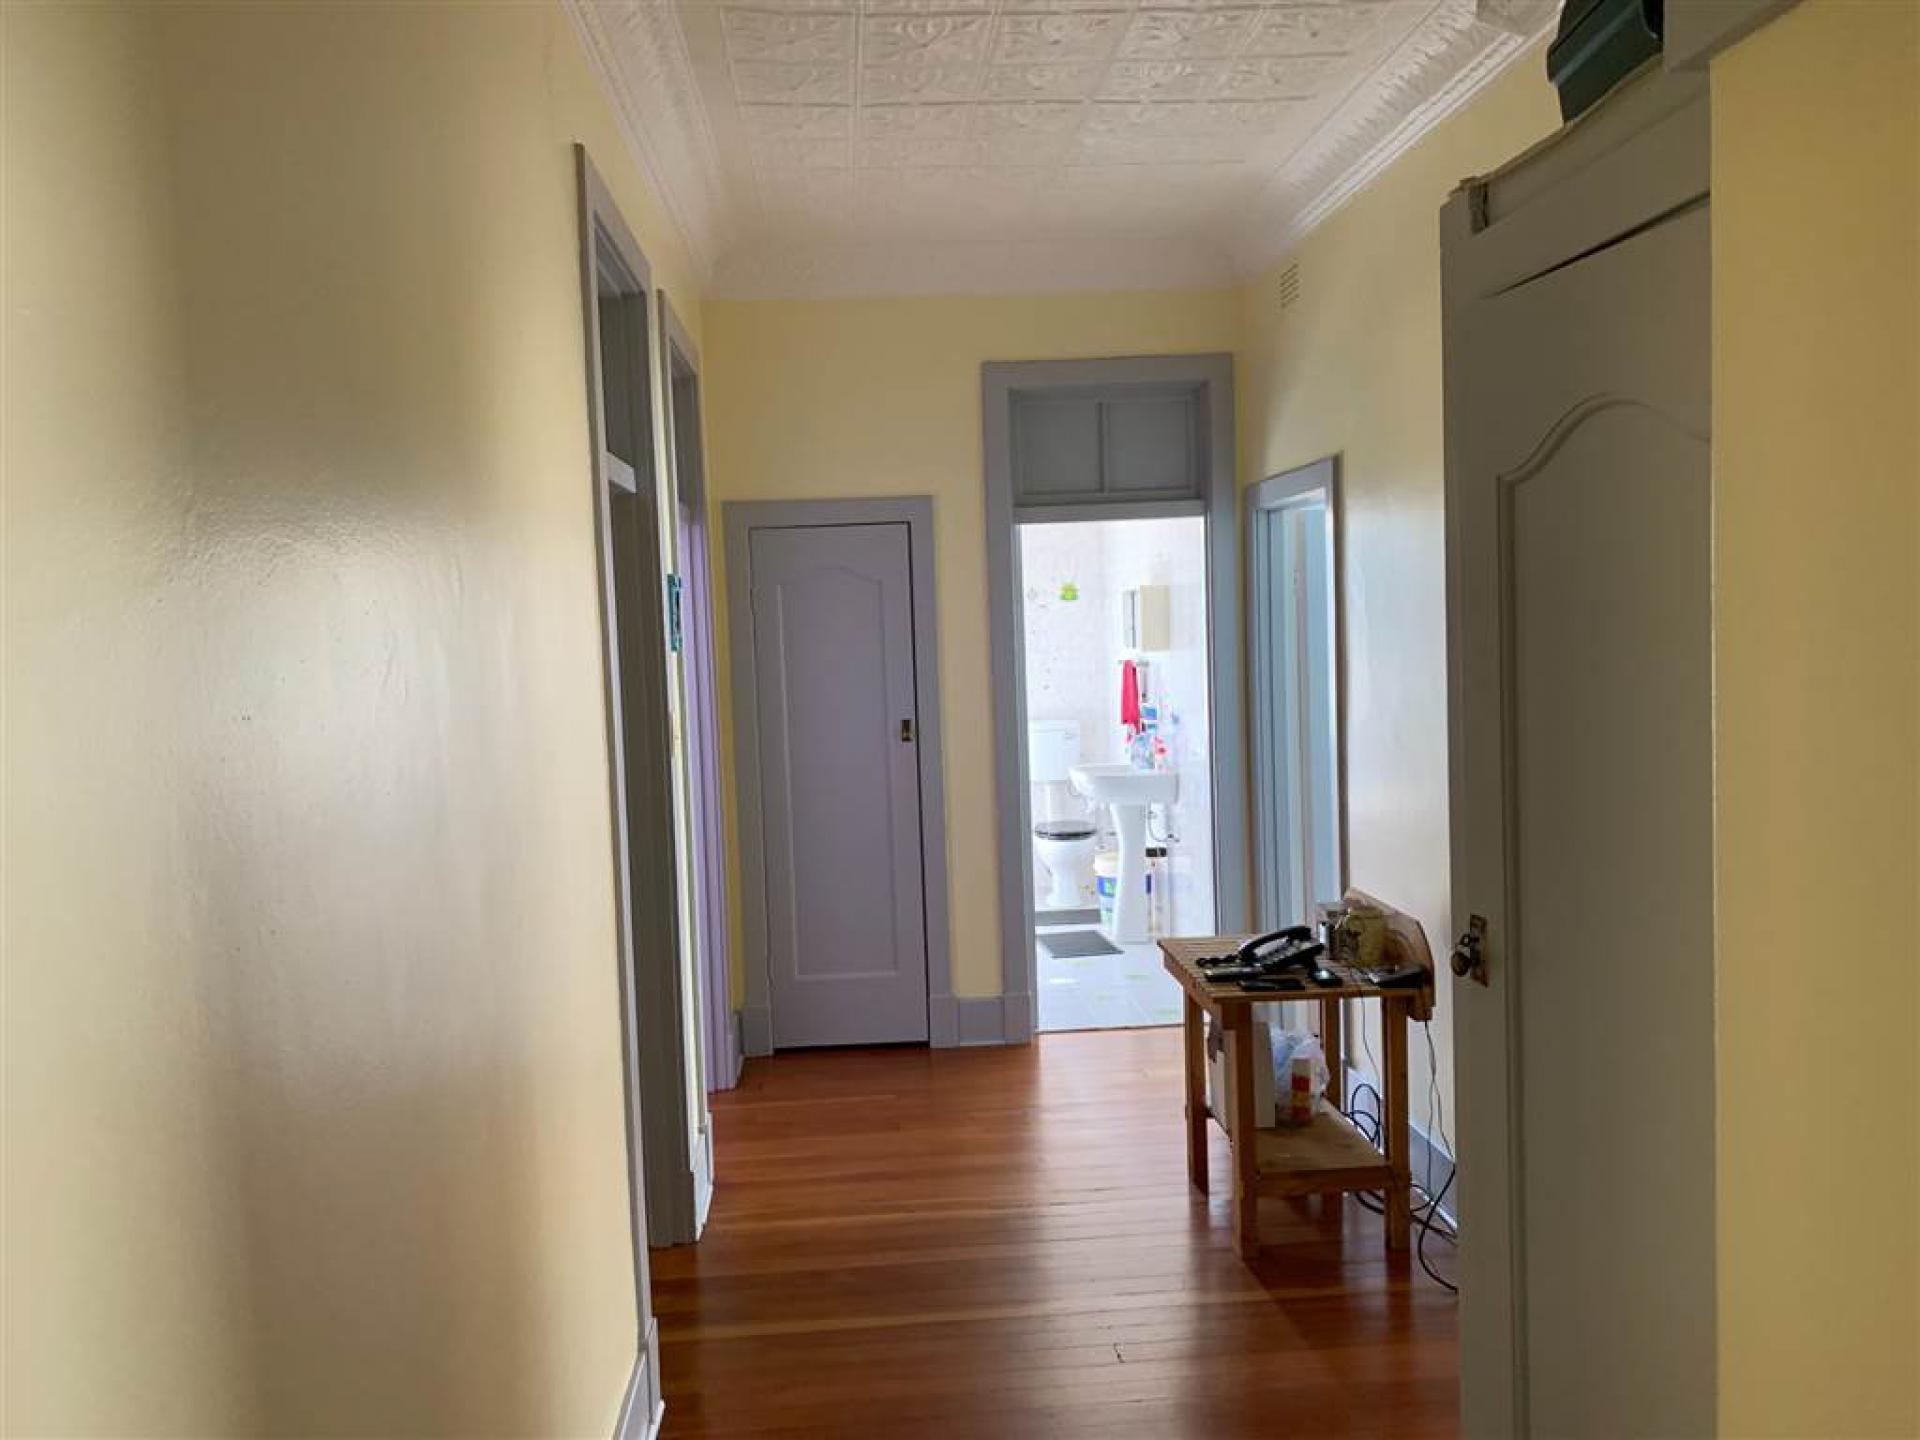 3 Bedroom House For Sale For Sale In Kensington Jhb